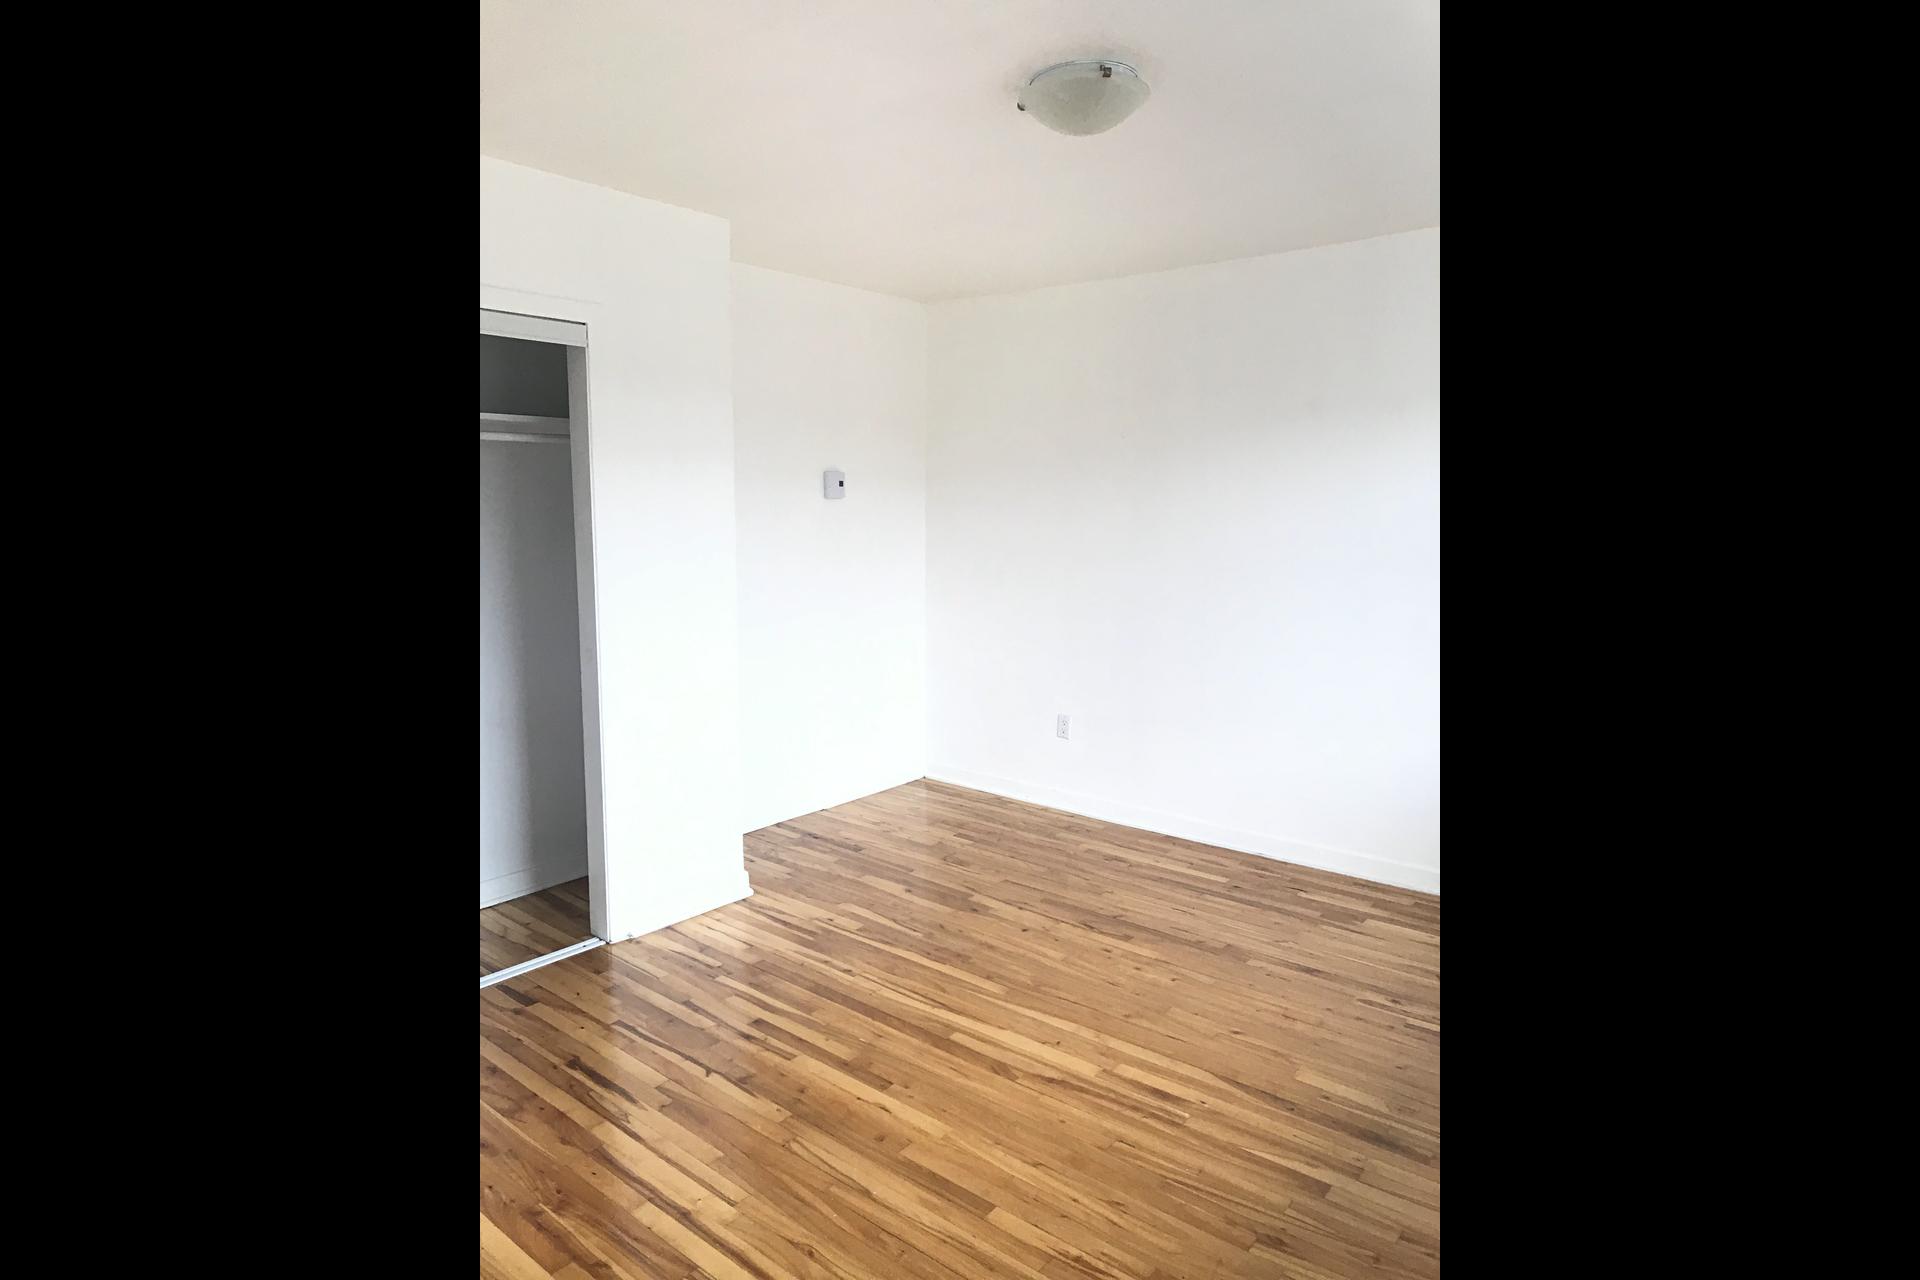 image 5 - 公寓 出租 Montréal - 4 室